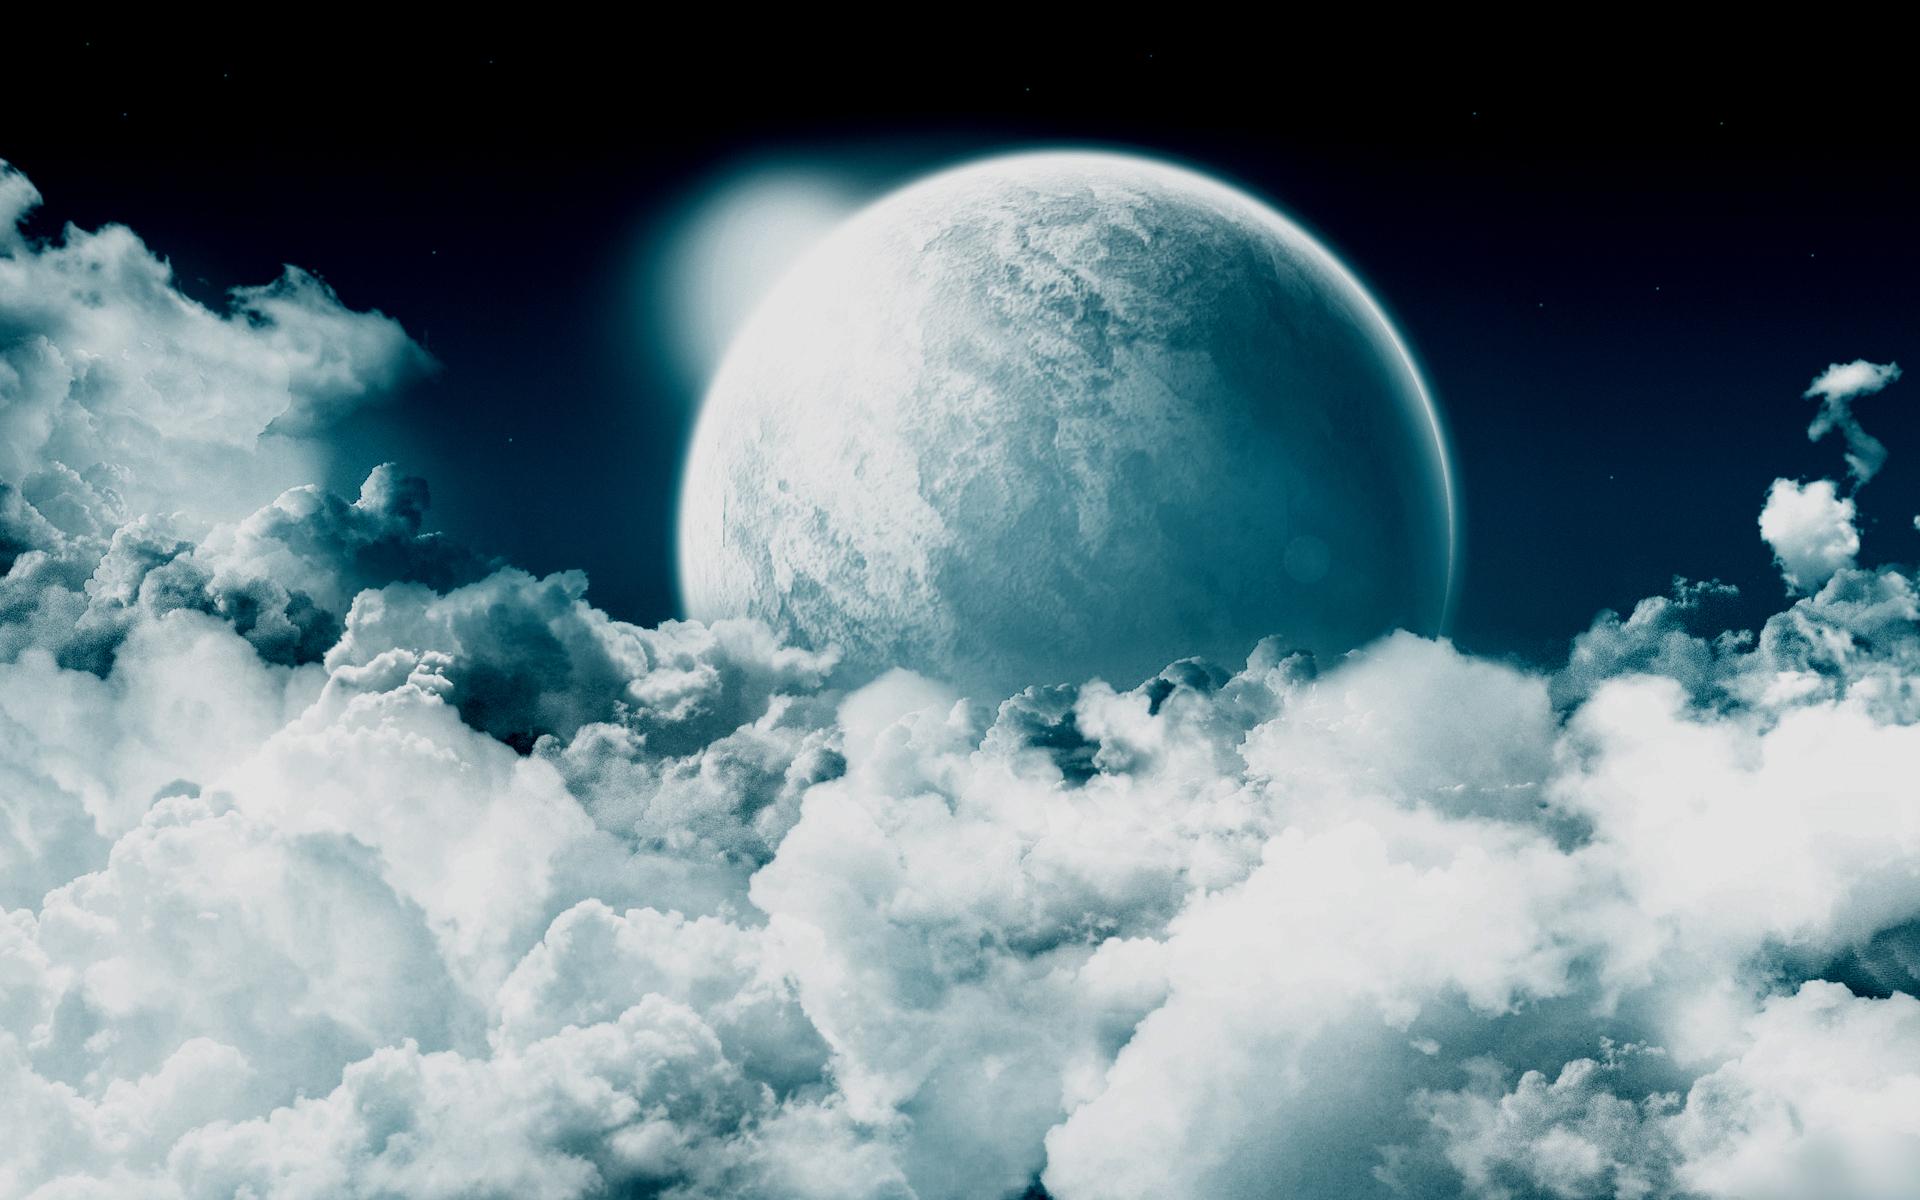 планета среди облаков, небо, космос, space wallpaper